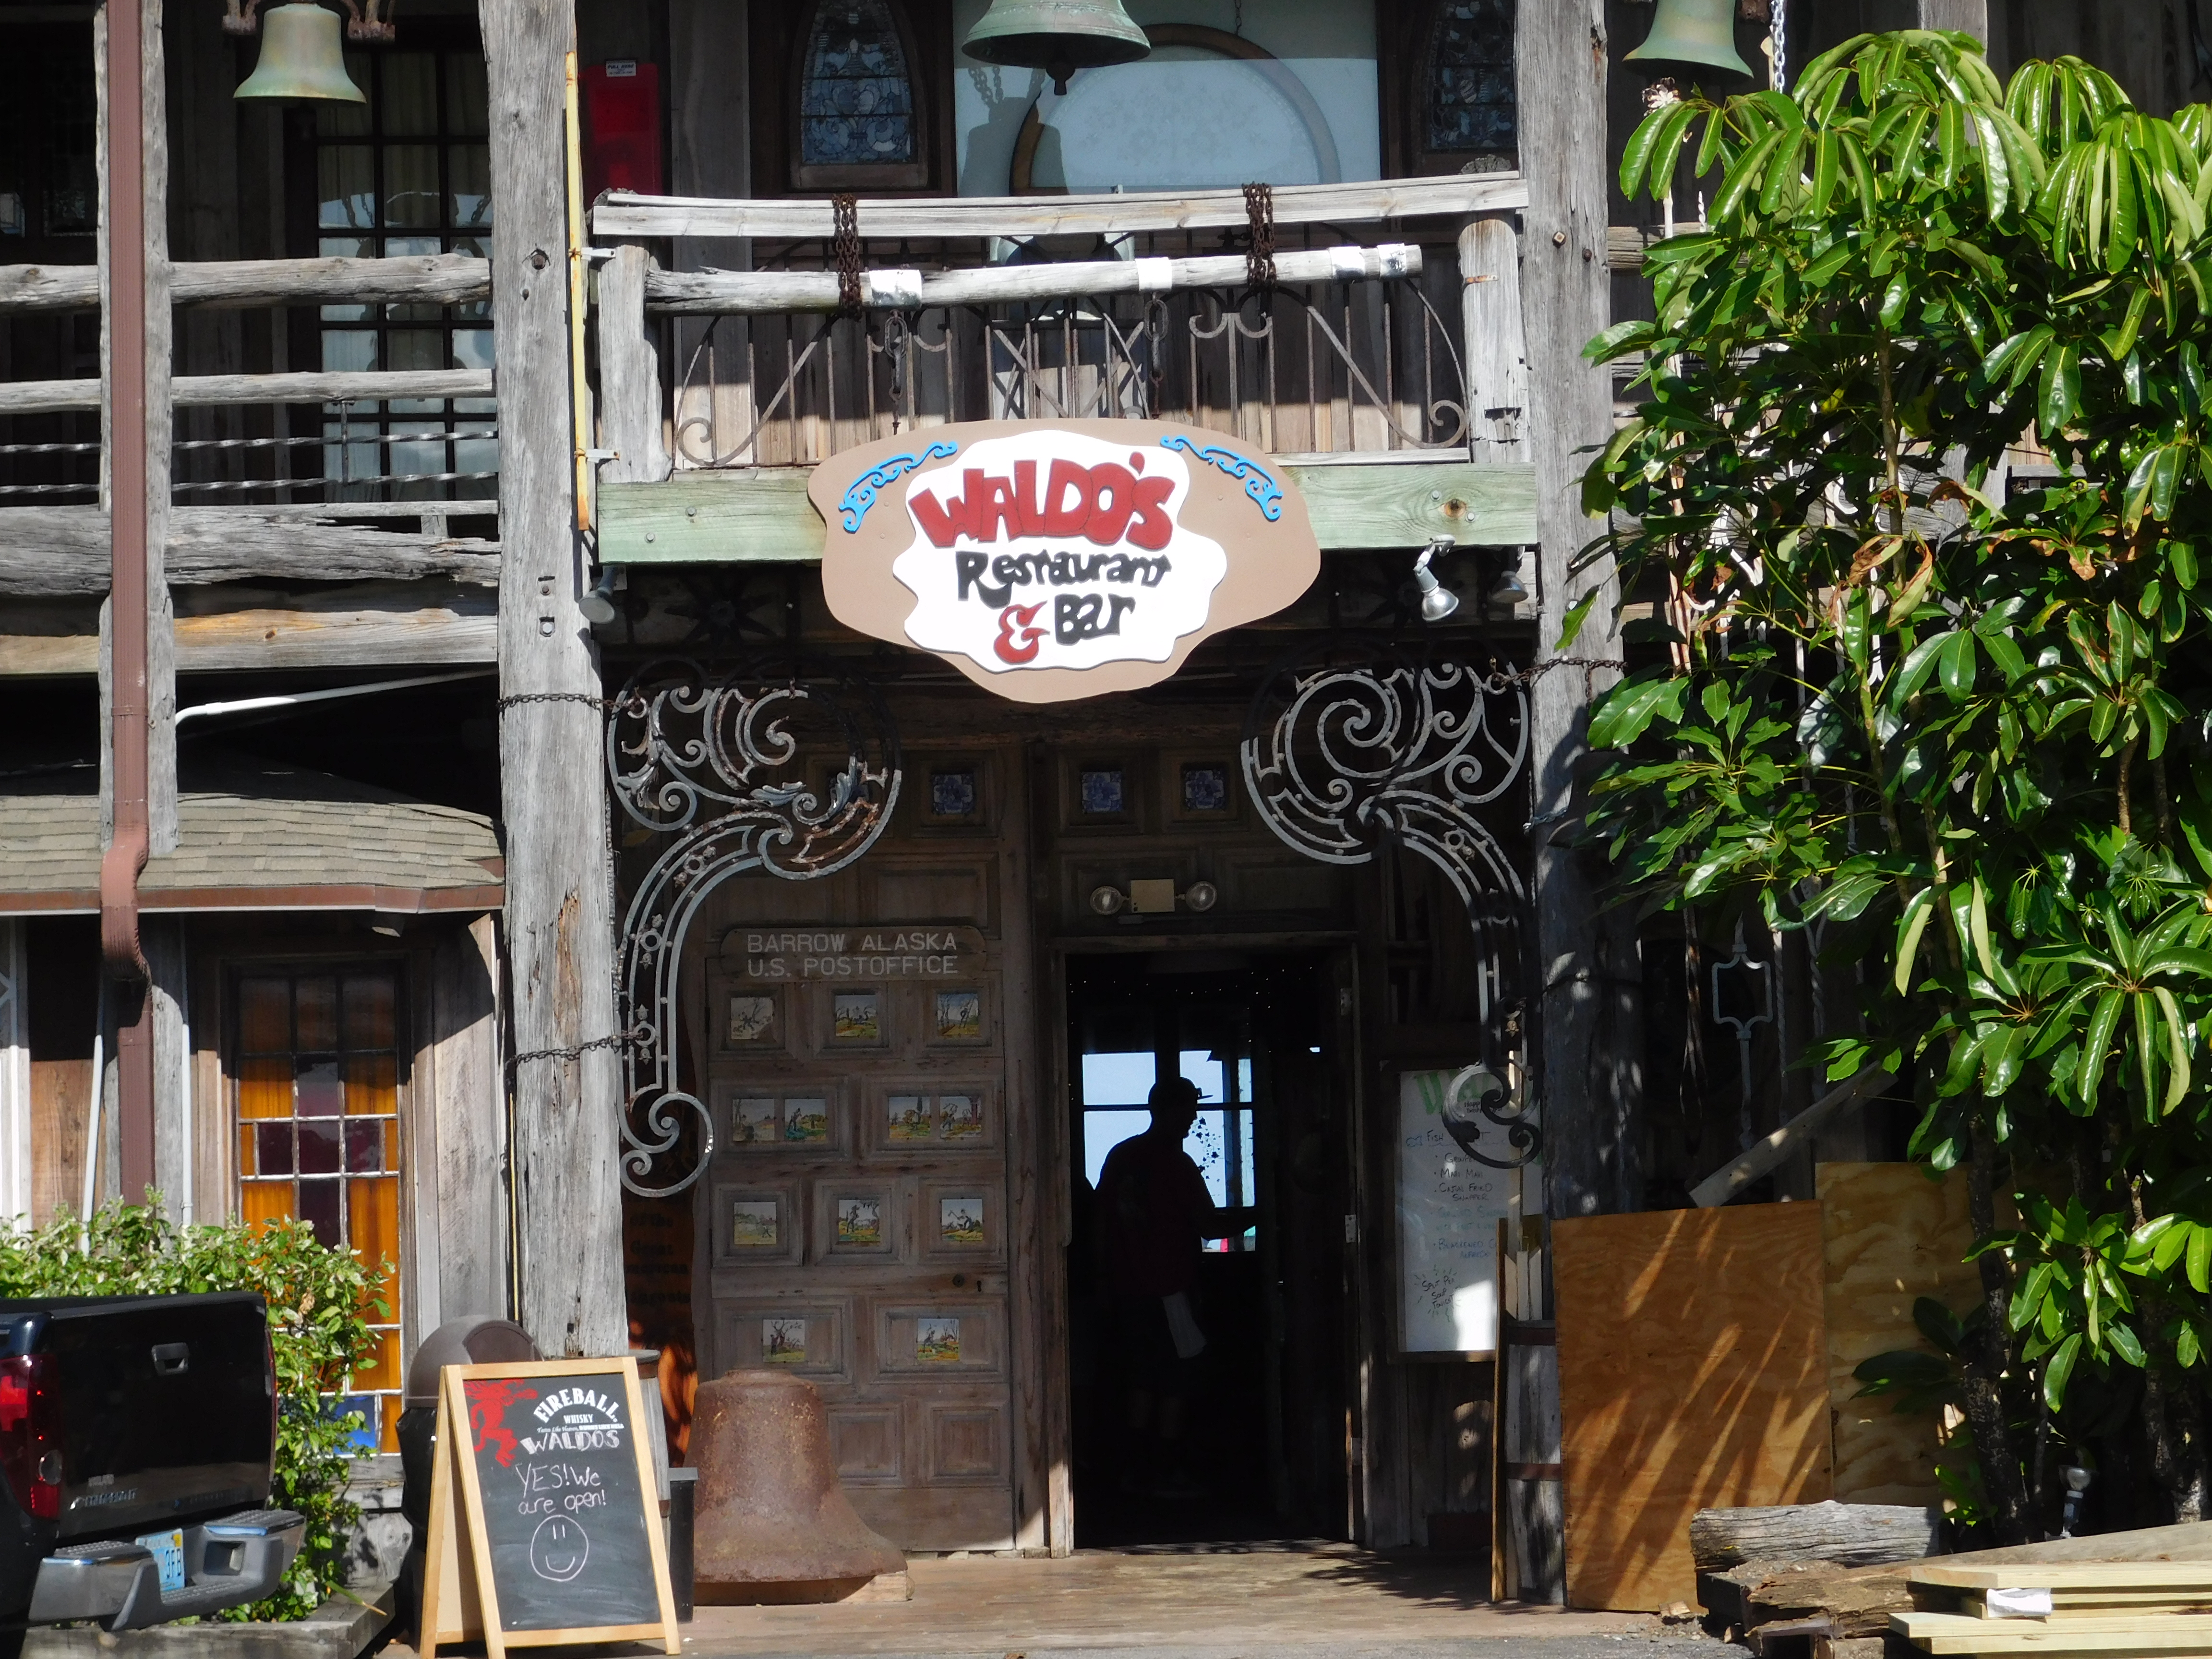 File Driftwood Resort And Waldo S Historic Restaurant Entrance In Vero Beach Fl 8570